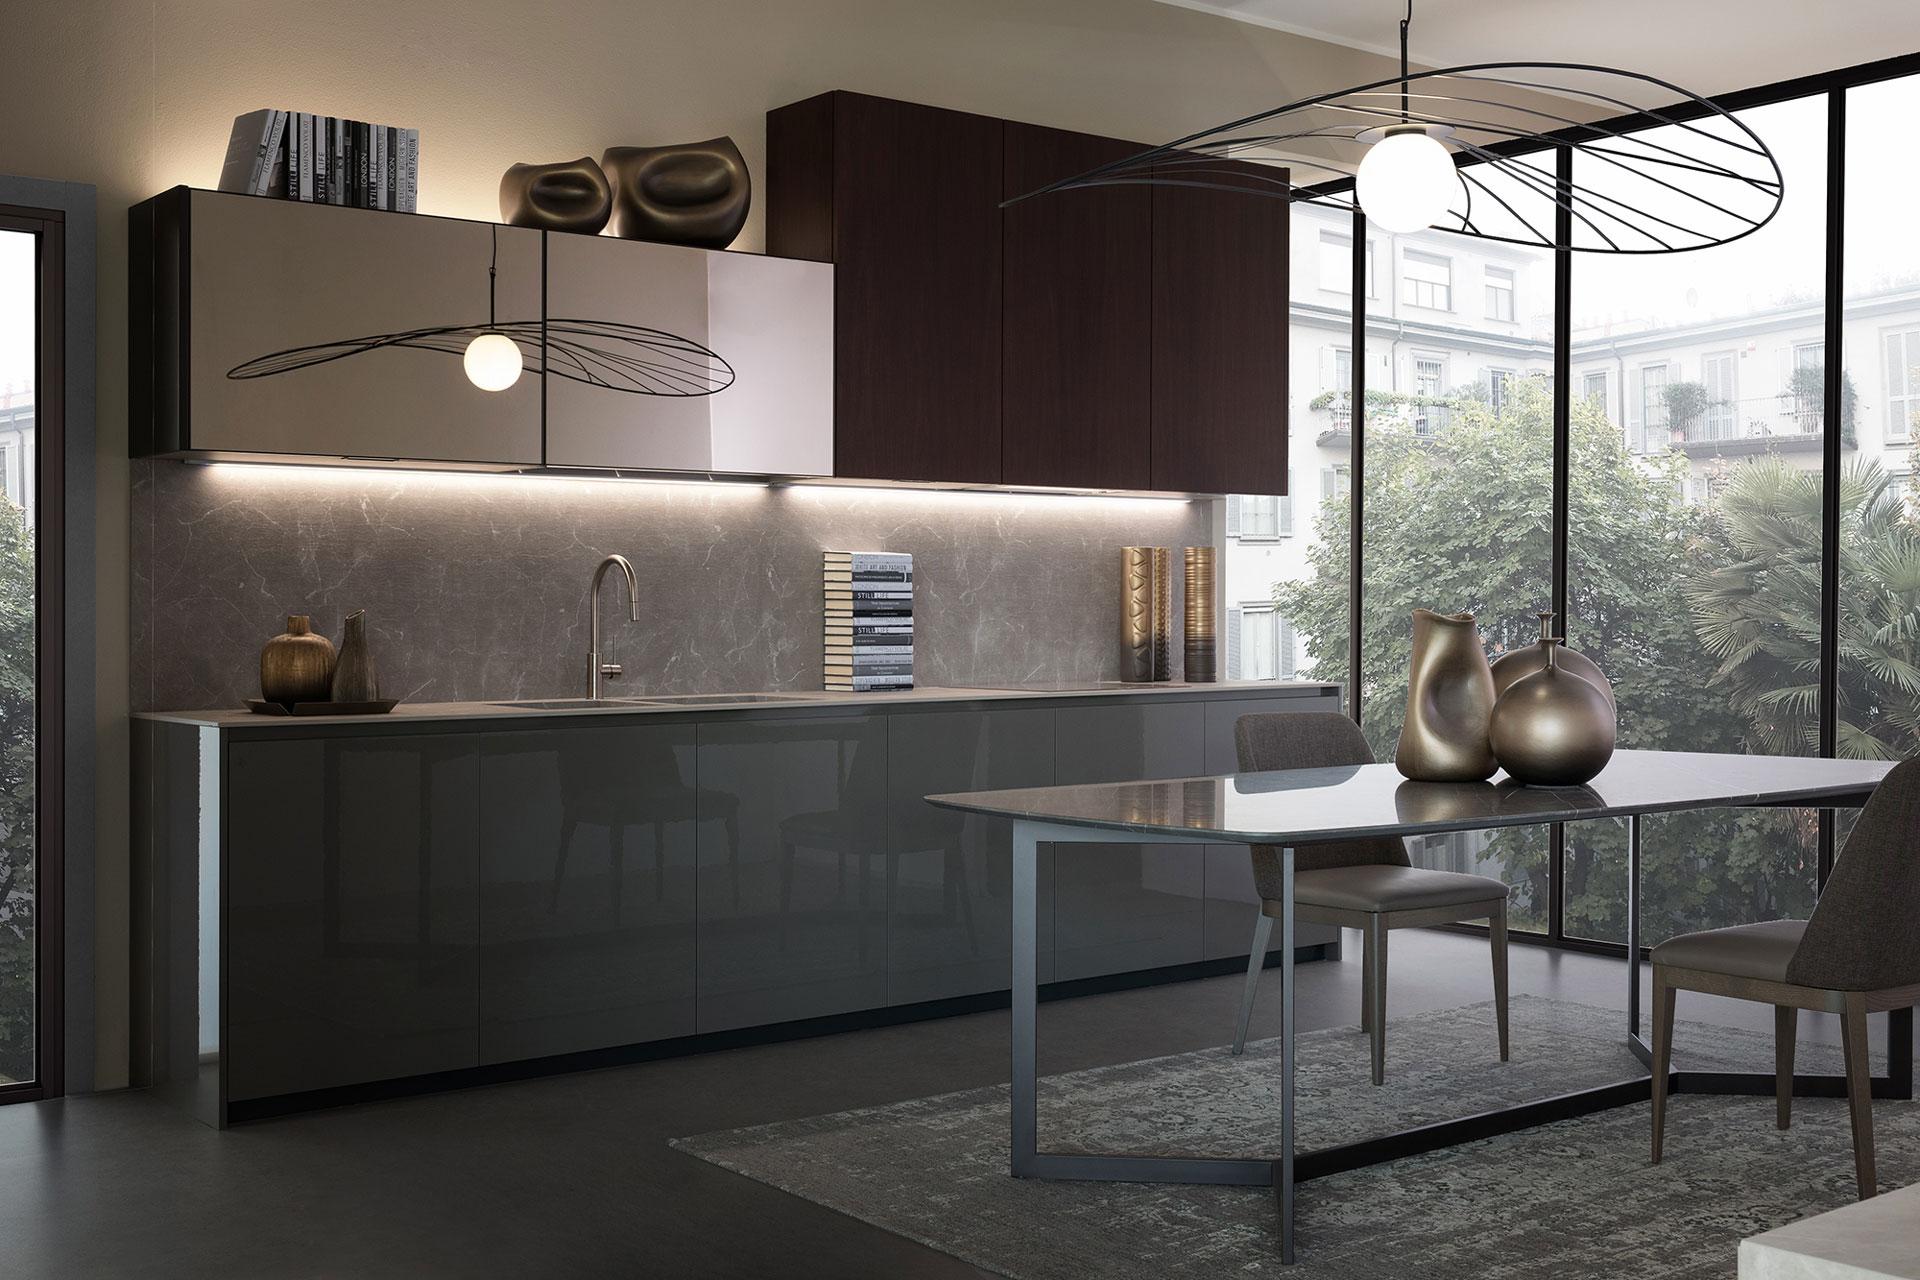 cucina contemporanea - cucine